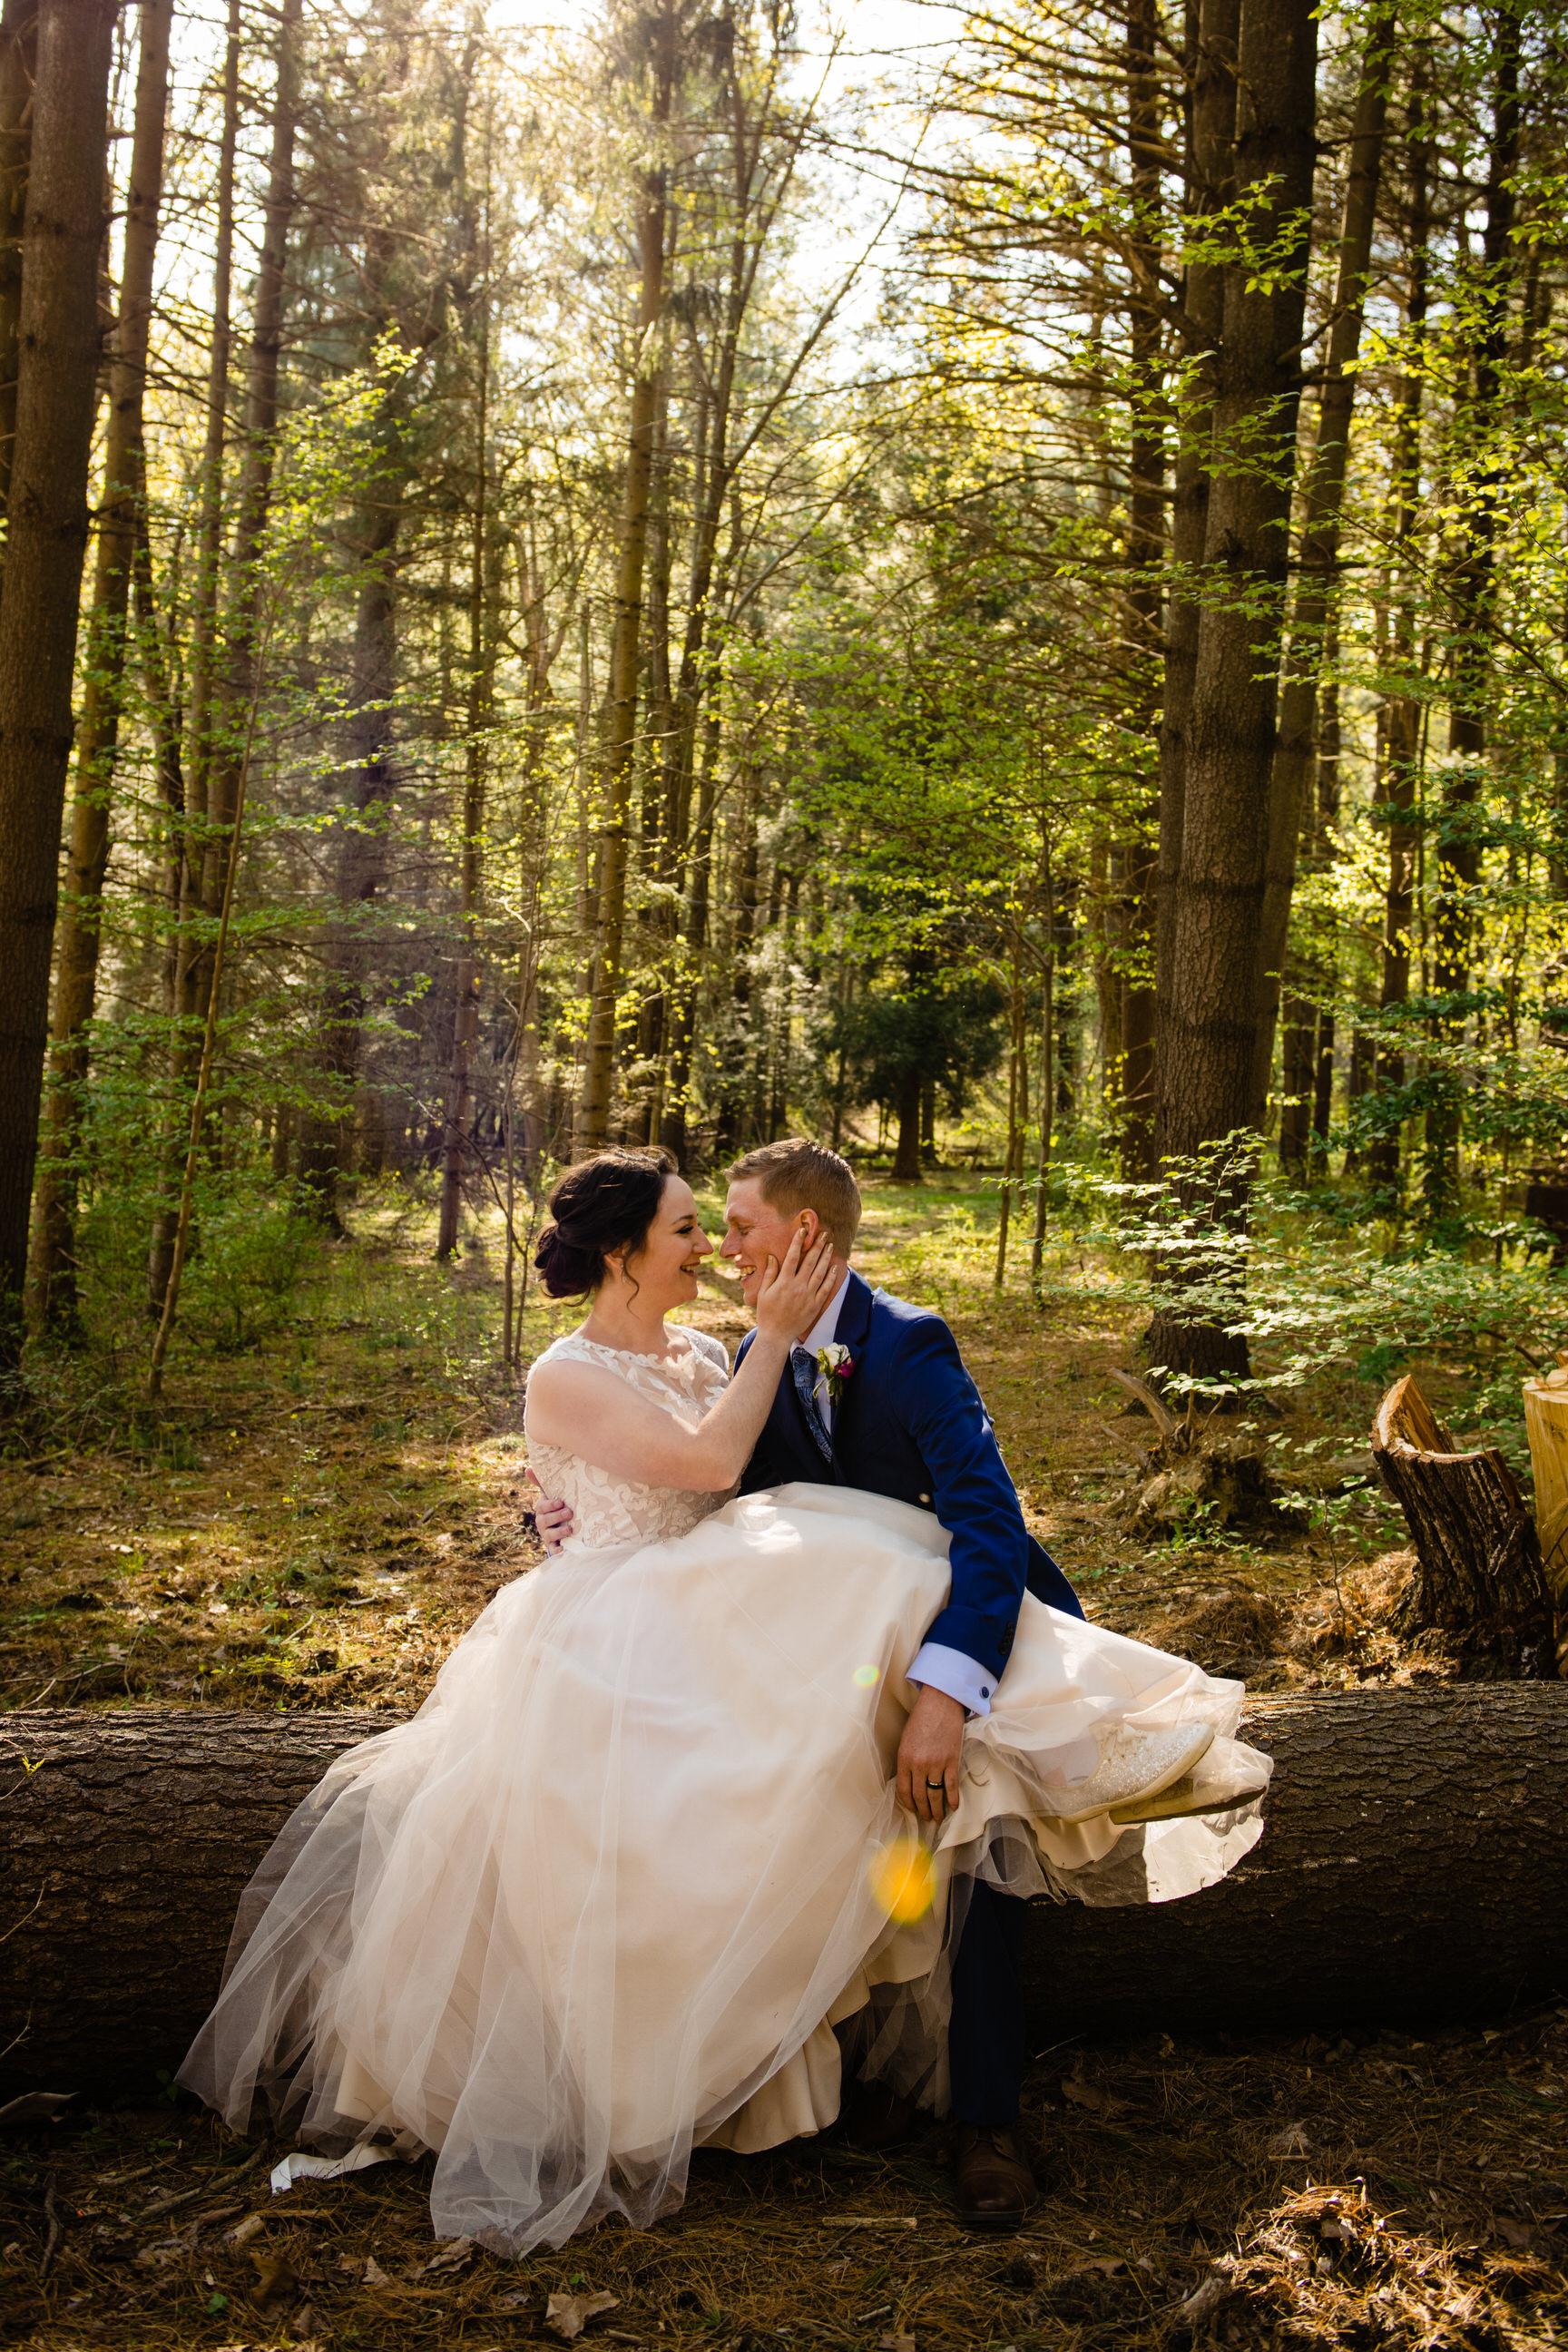 ThorpewoodWedding-Eileen&Chris-6089.jpg